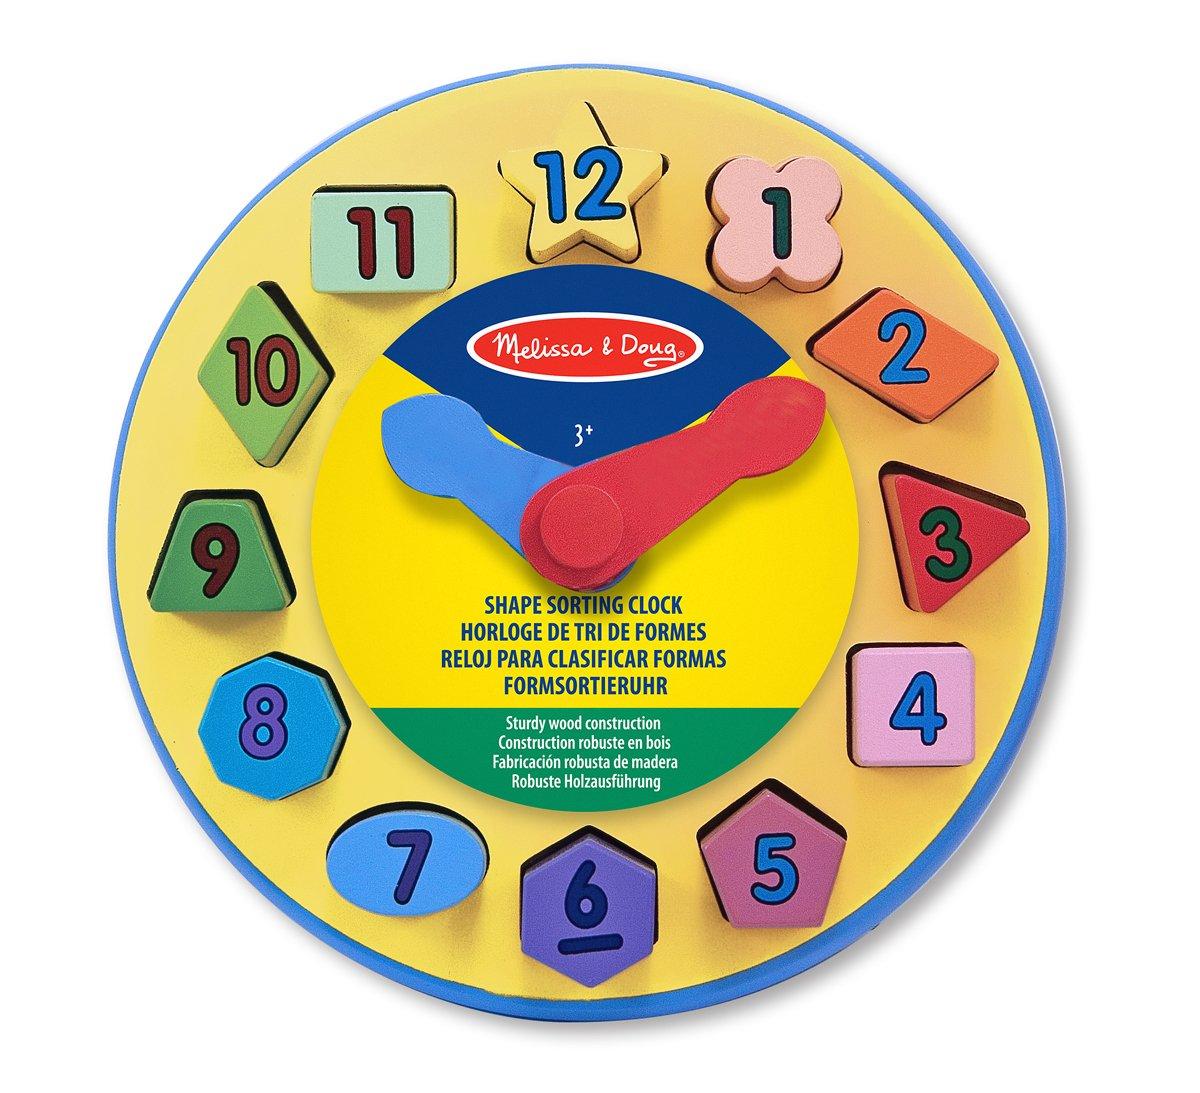 Melissa & Doug Wooden Shape Sorting Learning Clock